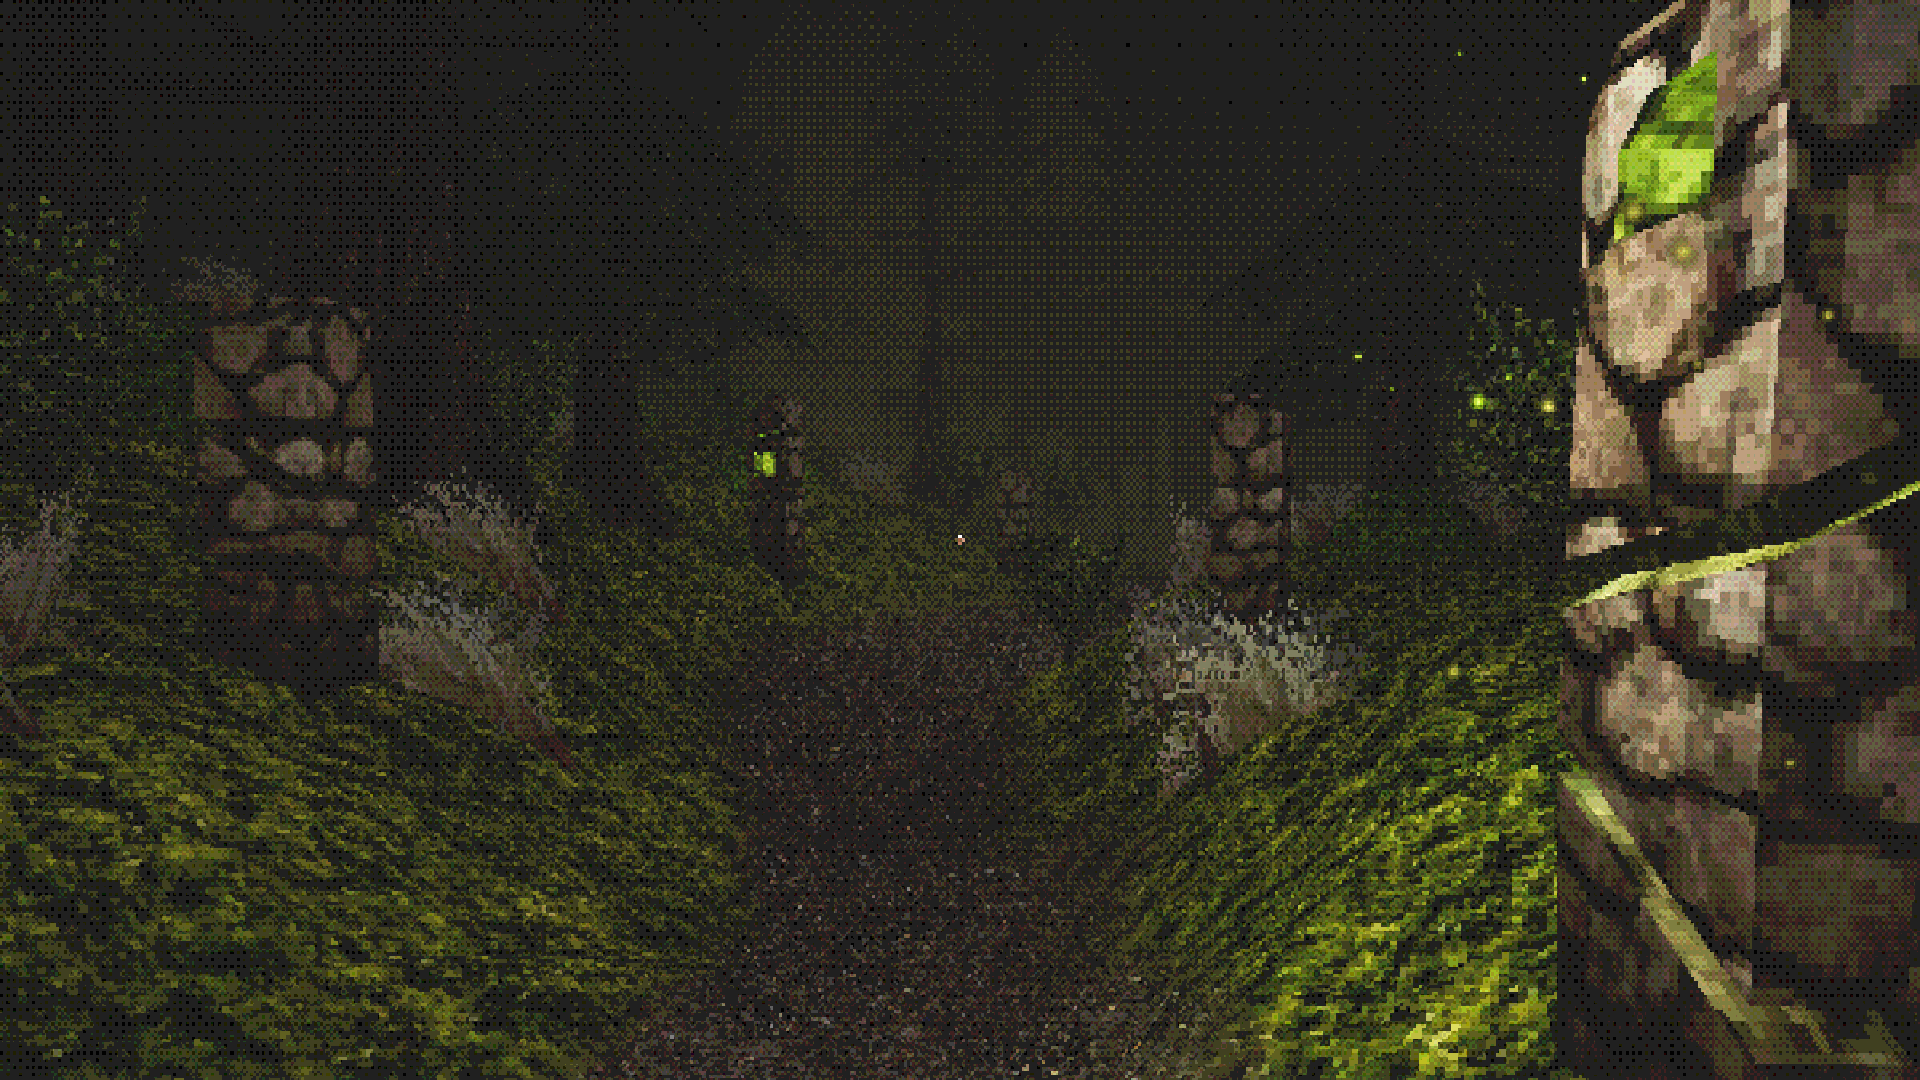 Haunted PS1 Demo Disc 2020